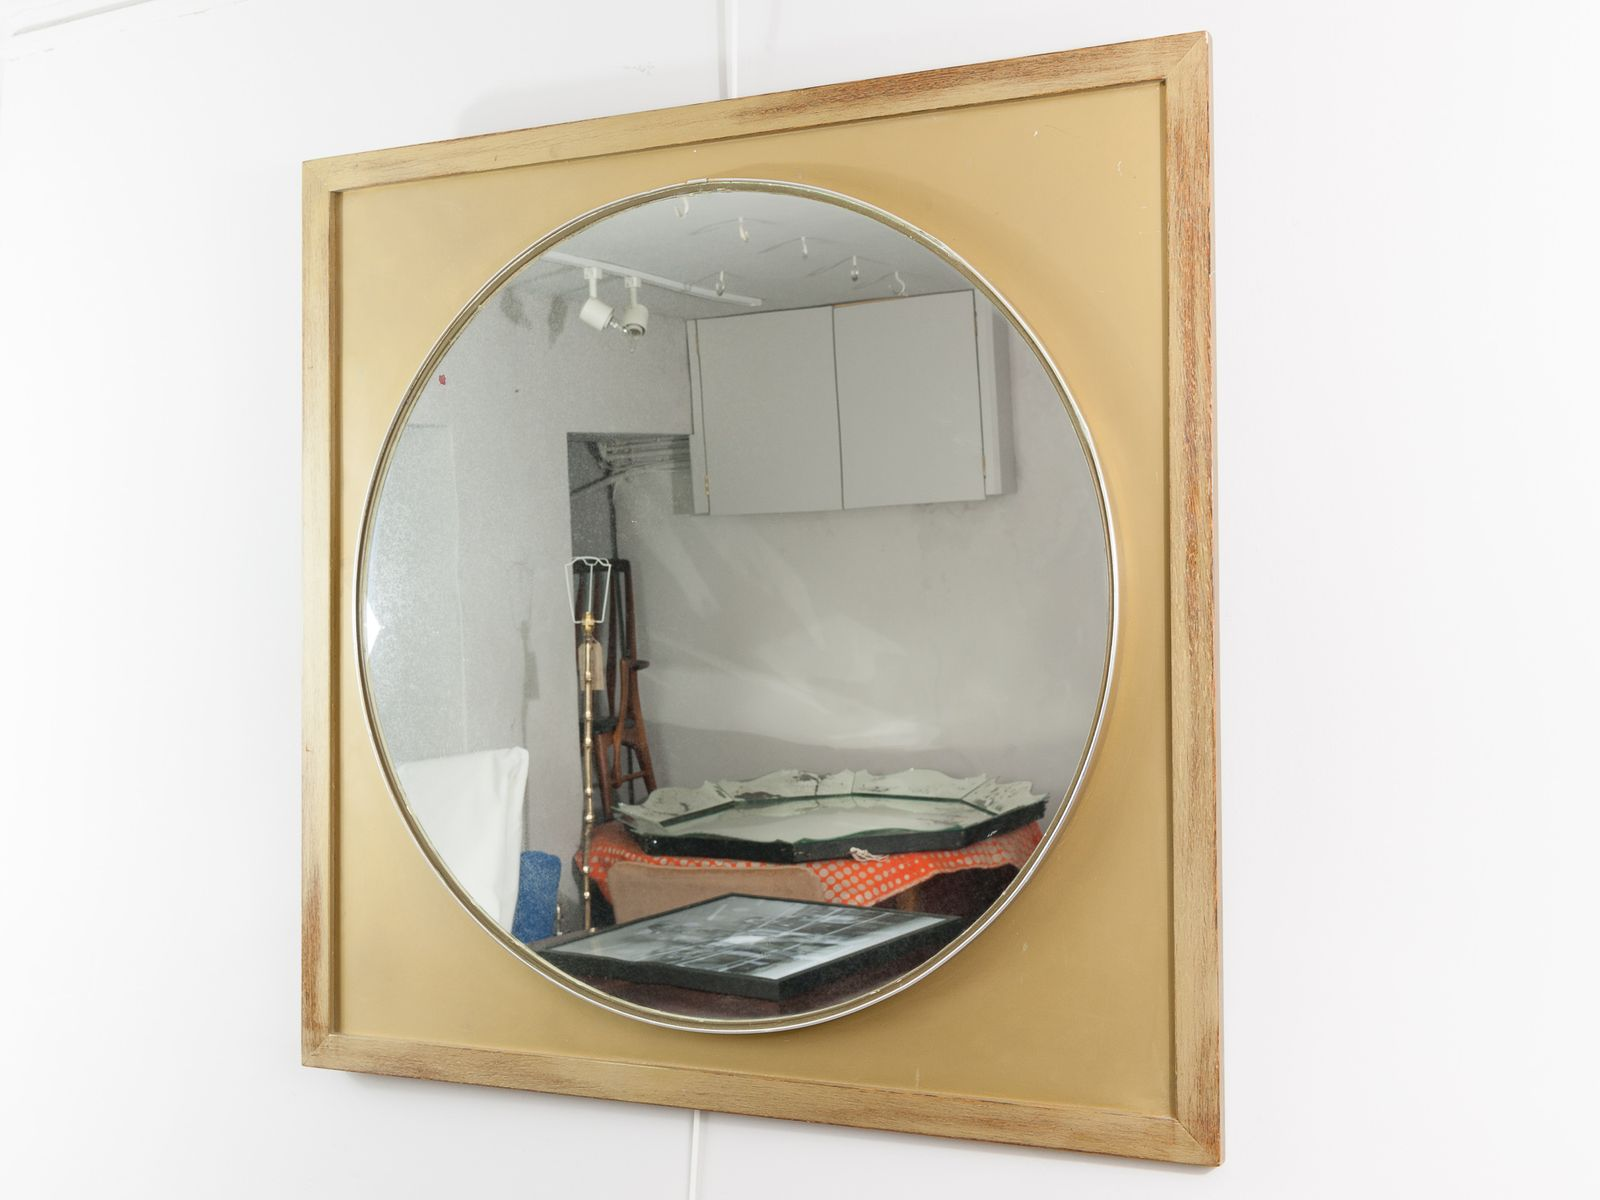 gro er runder vintage spiegel mit goldenem holzrahmen bei pamono kaufen. Black Bedroom Furniture Sets. Home Design Ideas